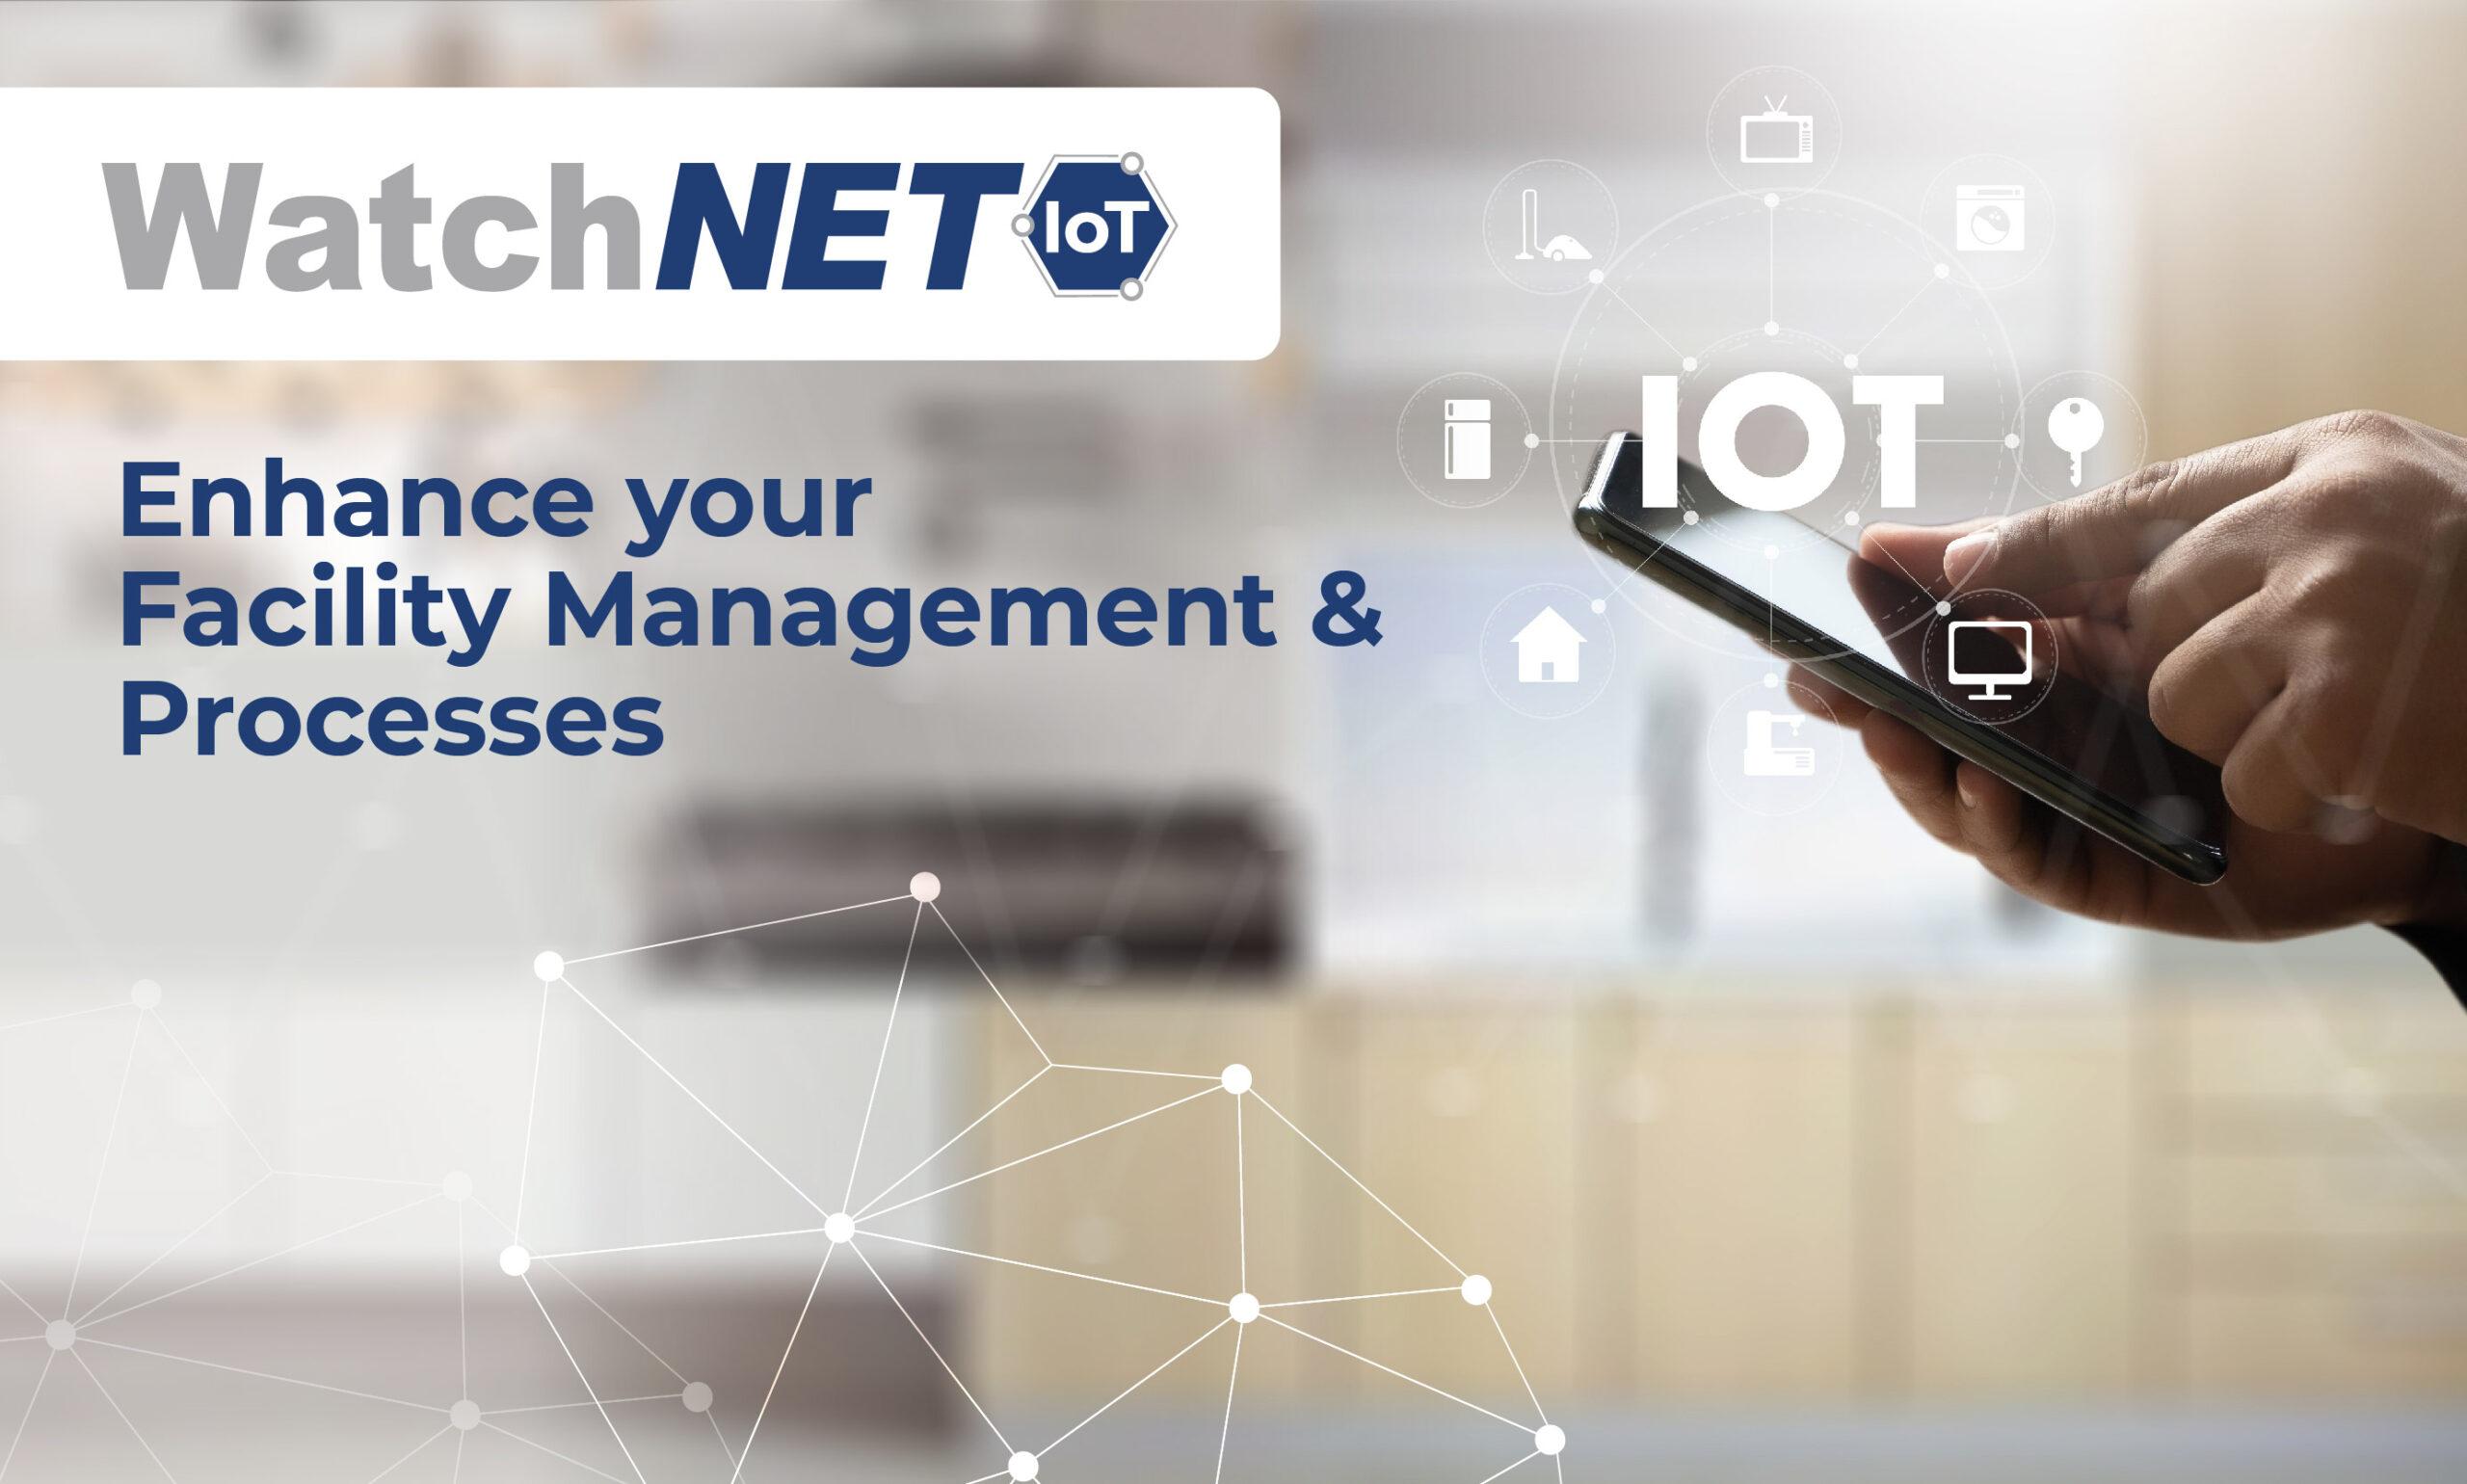 Enhance your Facility Management & Process